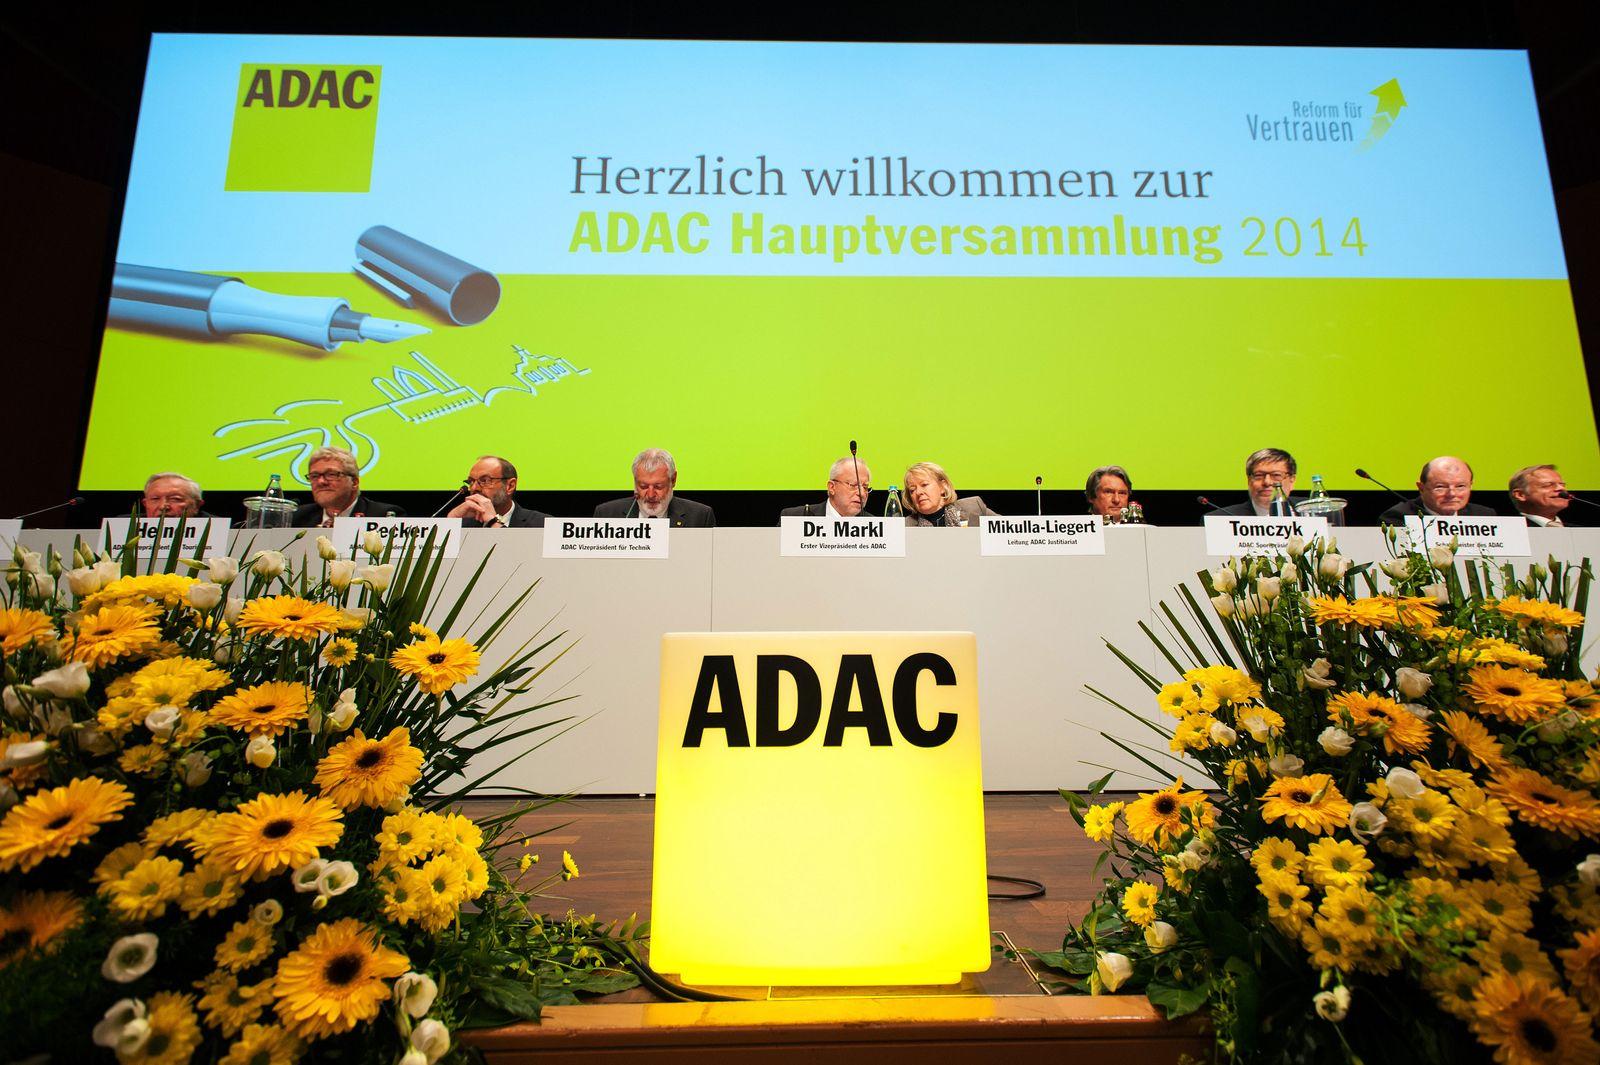 ADAC / Hauptversammlung